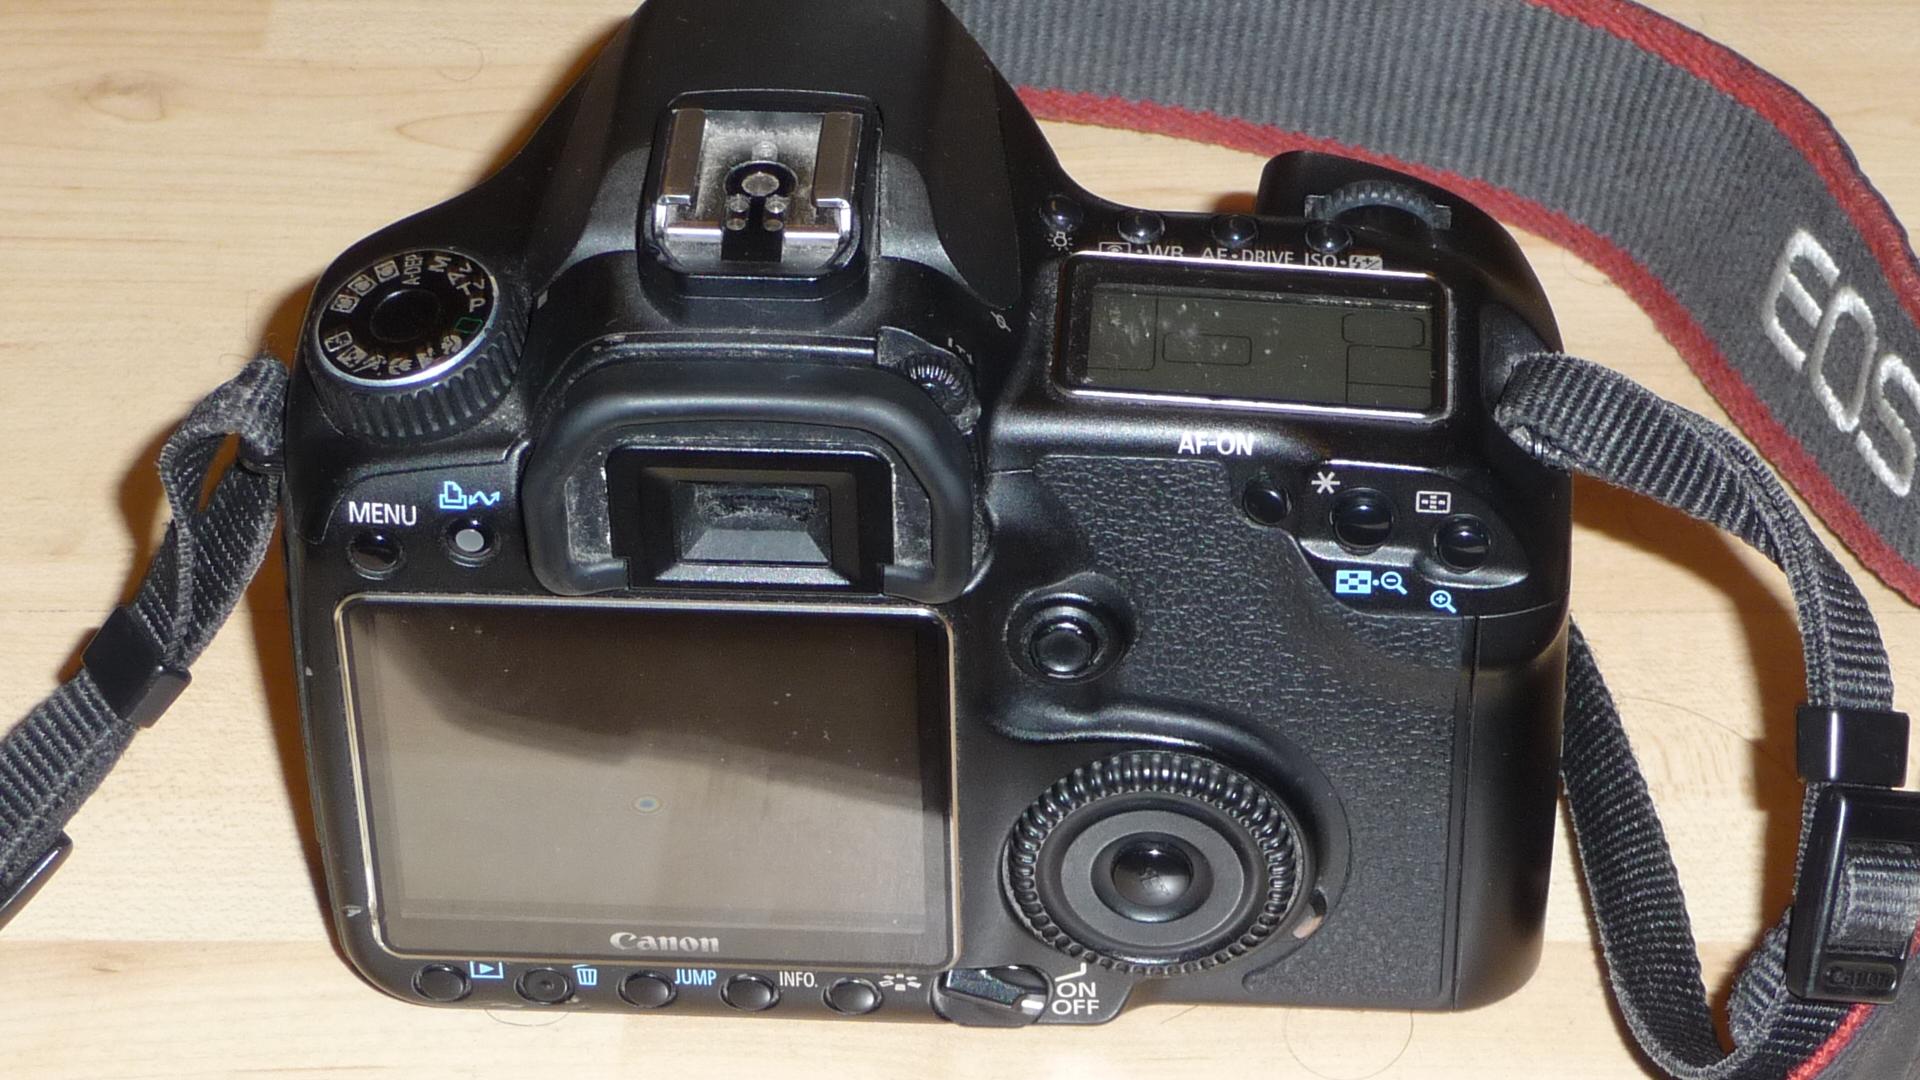 54424_Canon40D-2_122_936lo.JPG